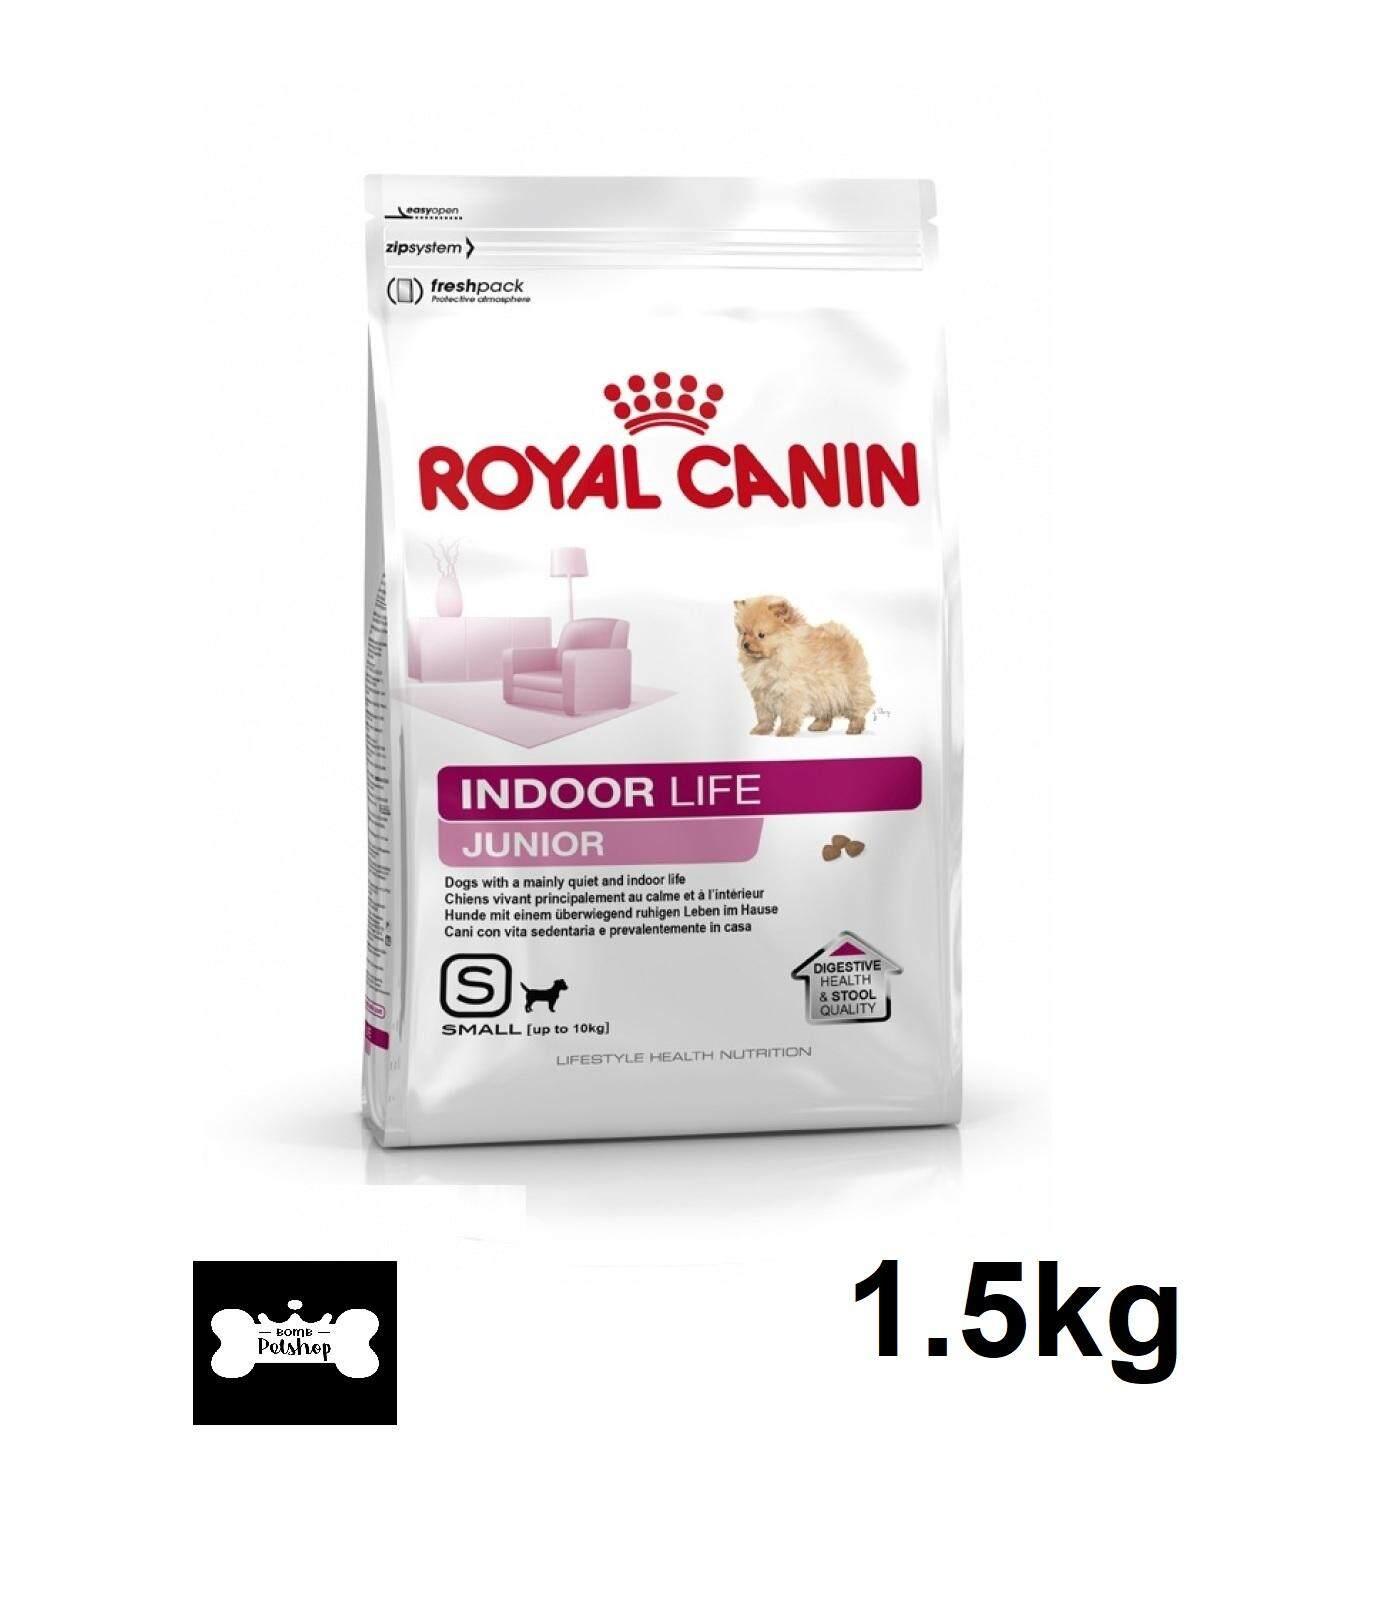 Royal Canin Indoor life Junior อาหารลูกสุนัข เลี้ยงในบ้าน ขนาด 1.5kg